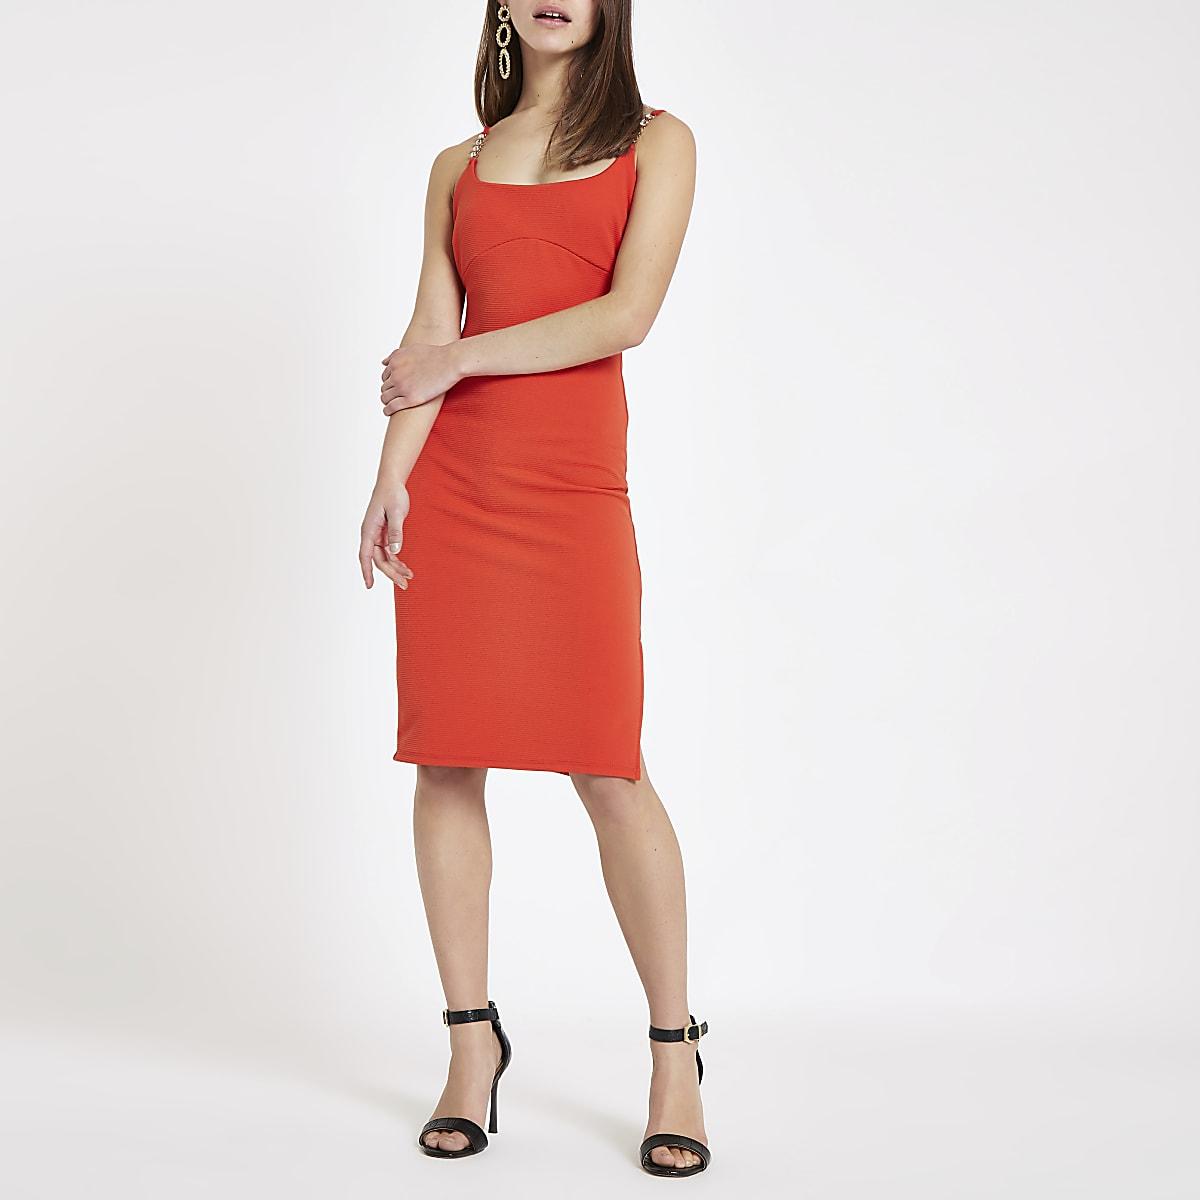 188641eb7261 Petite red ribbed diamante trim midi dress - Bodycon Dresses ...